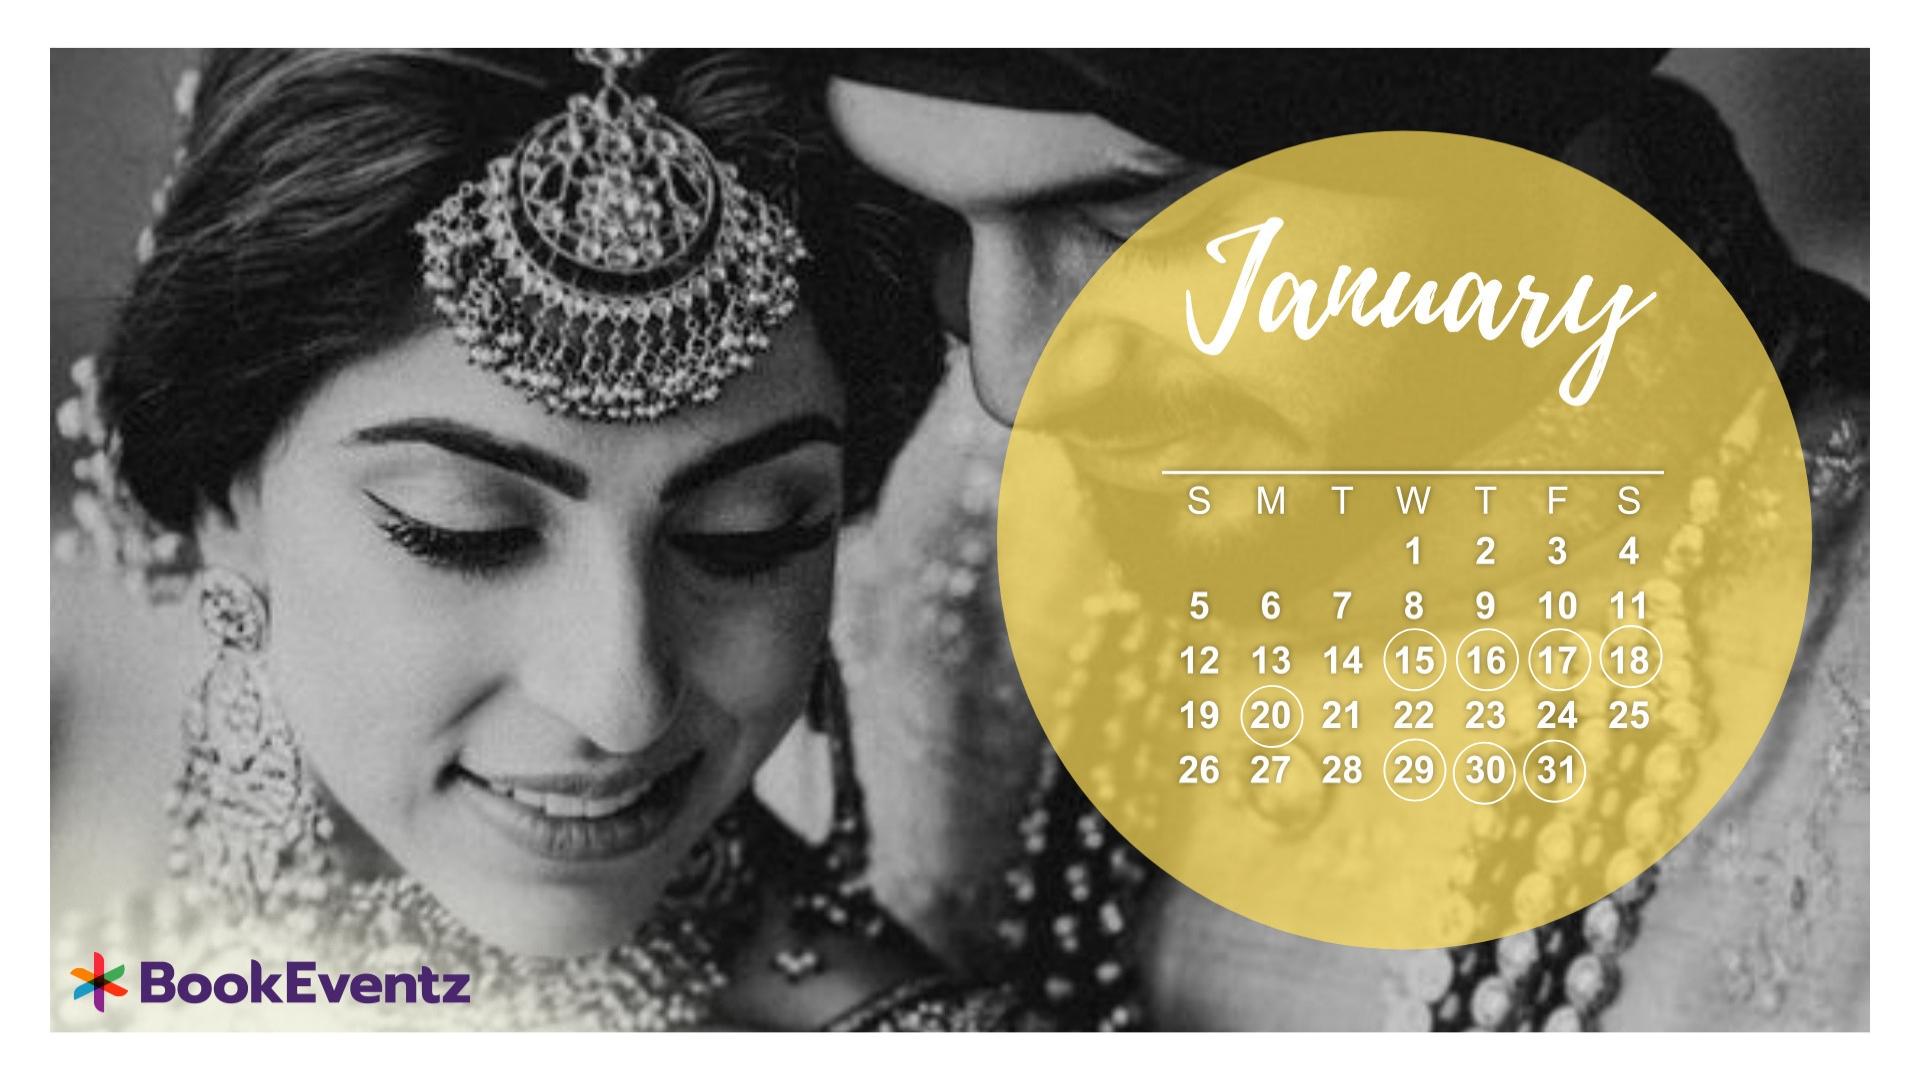 Shubh Muhurat Wedding Dates For Hindu Marriage In 2020 |-January 2020 Calendar Vivah Muhurat